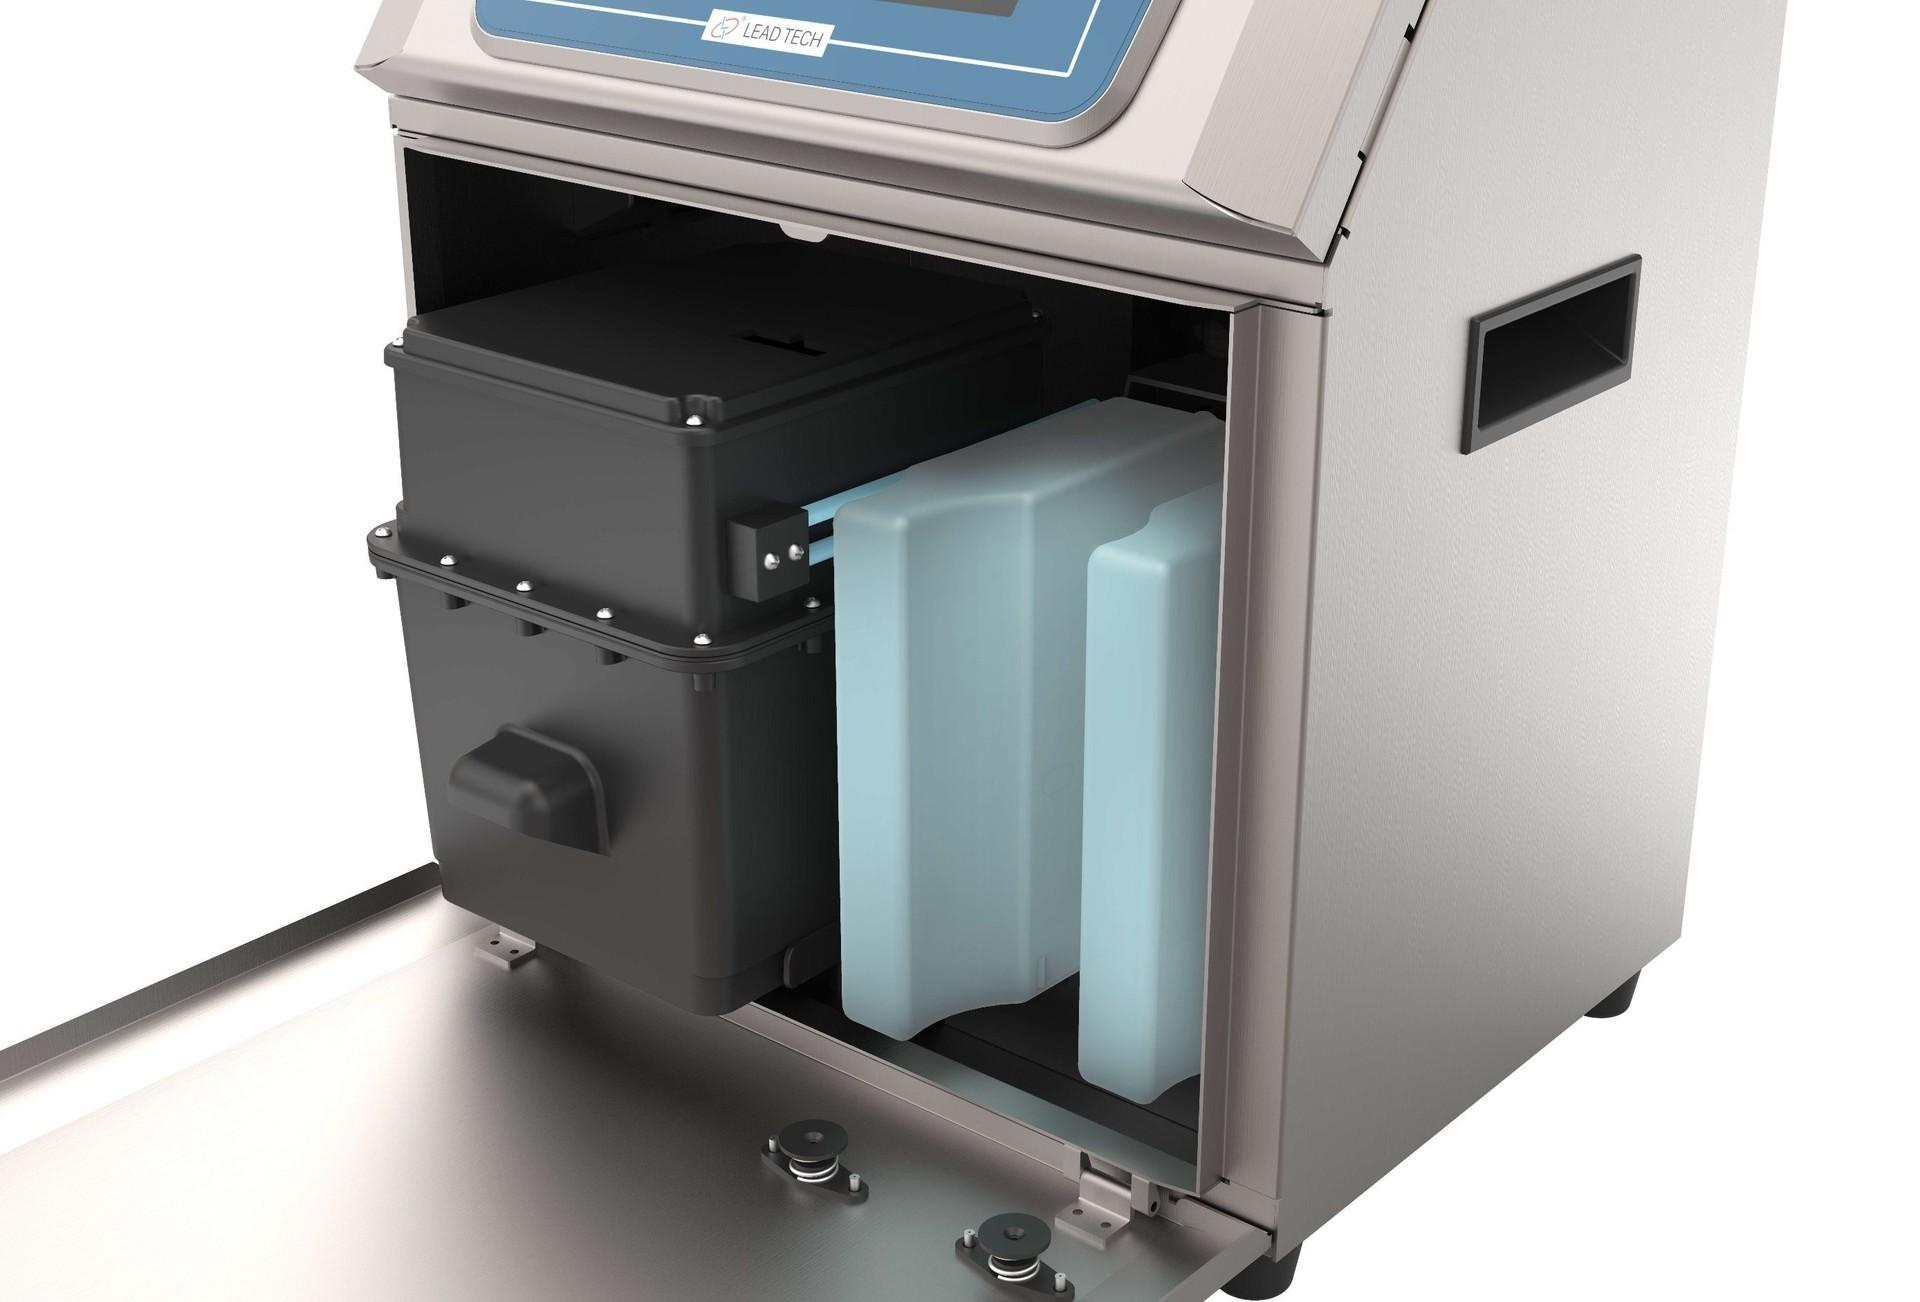 Lead Tech Plastic film Cij Inkjet Printer Lt800